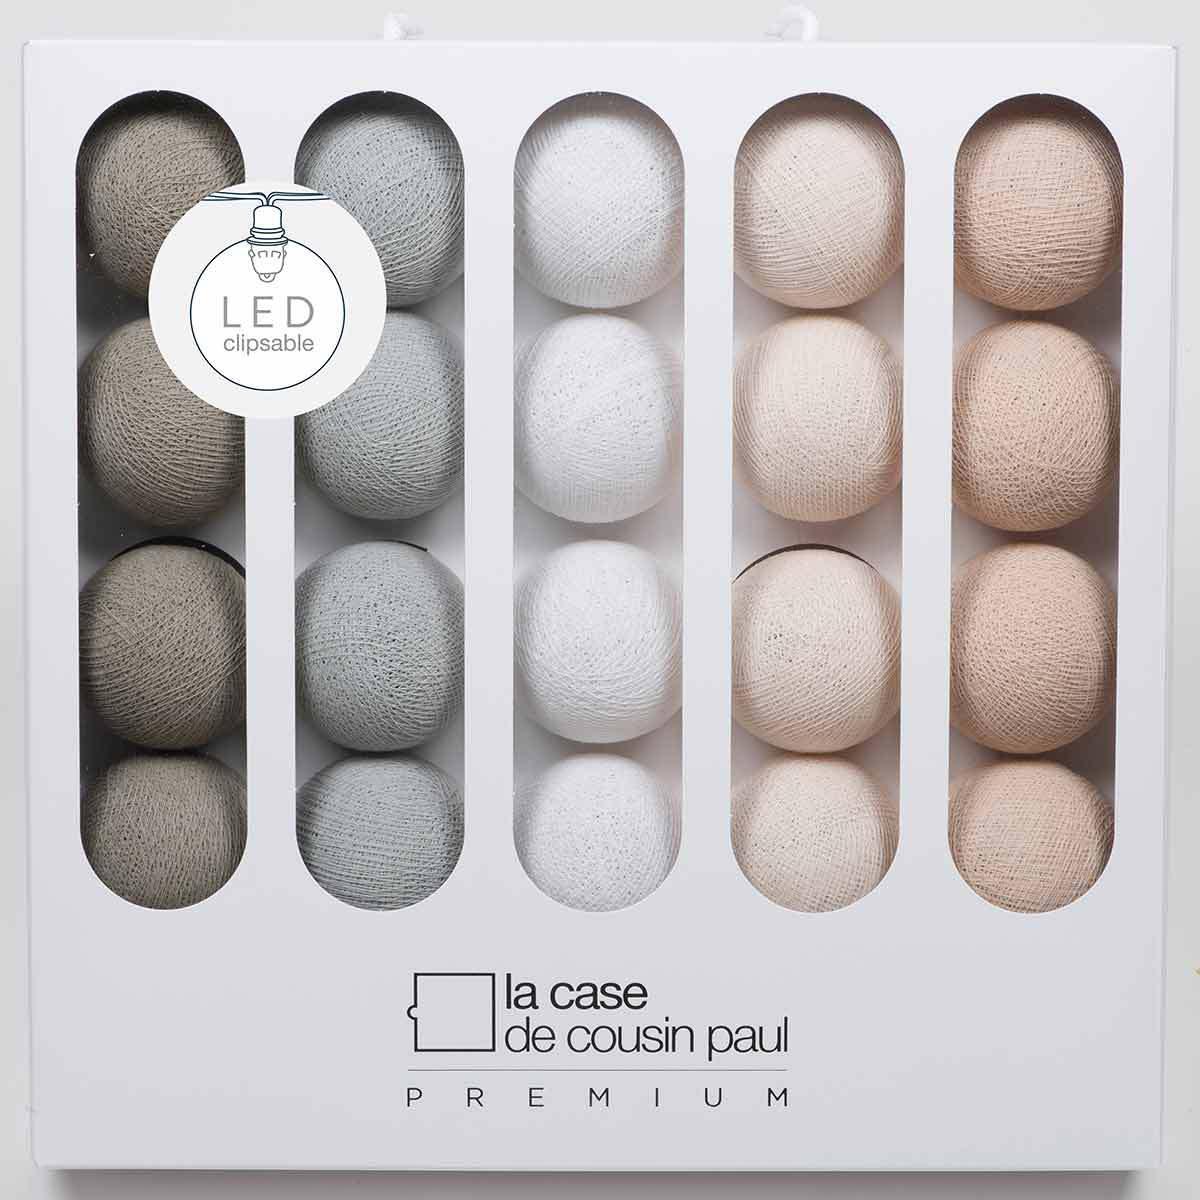 la case de cousin paul guirlande lumineuse patti led 20 boules suspension d corative la case. Black Bedroom Furniture Sets. Home Design Ideas